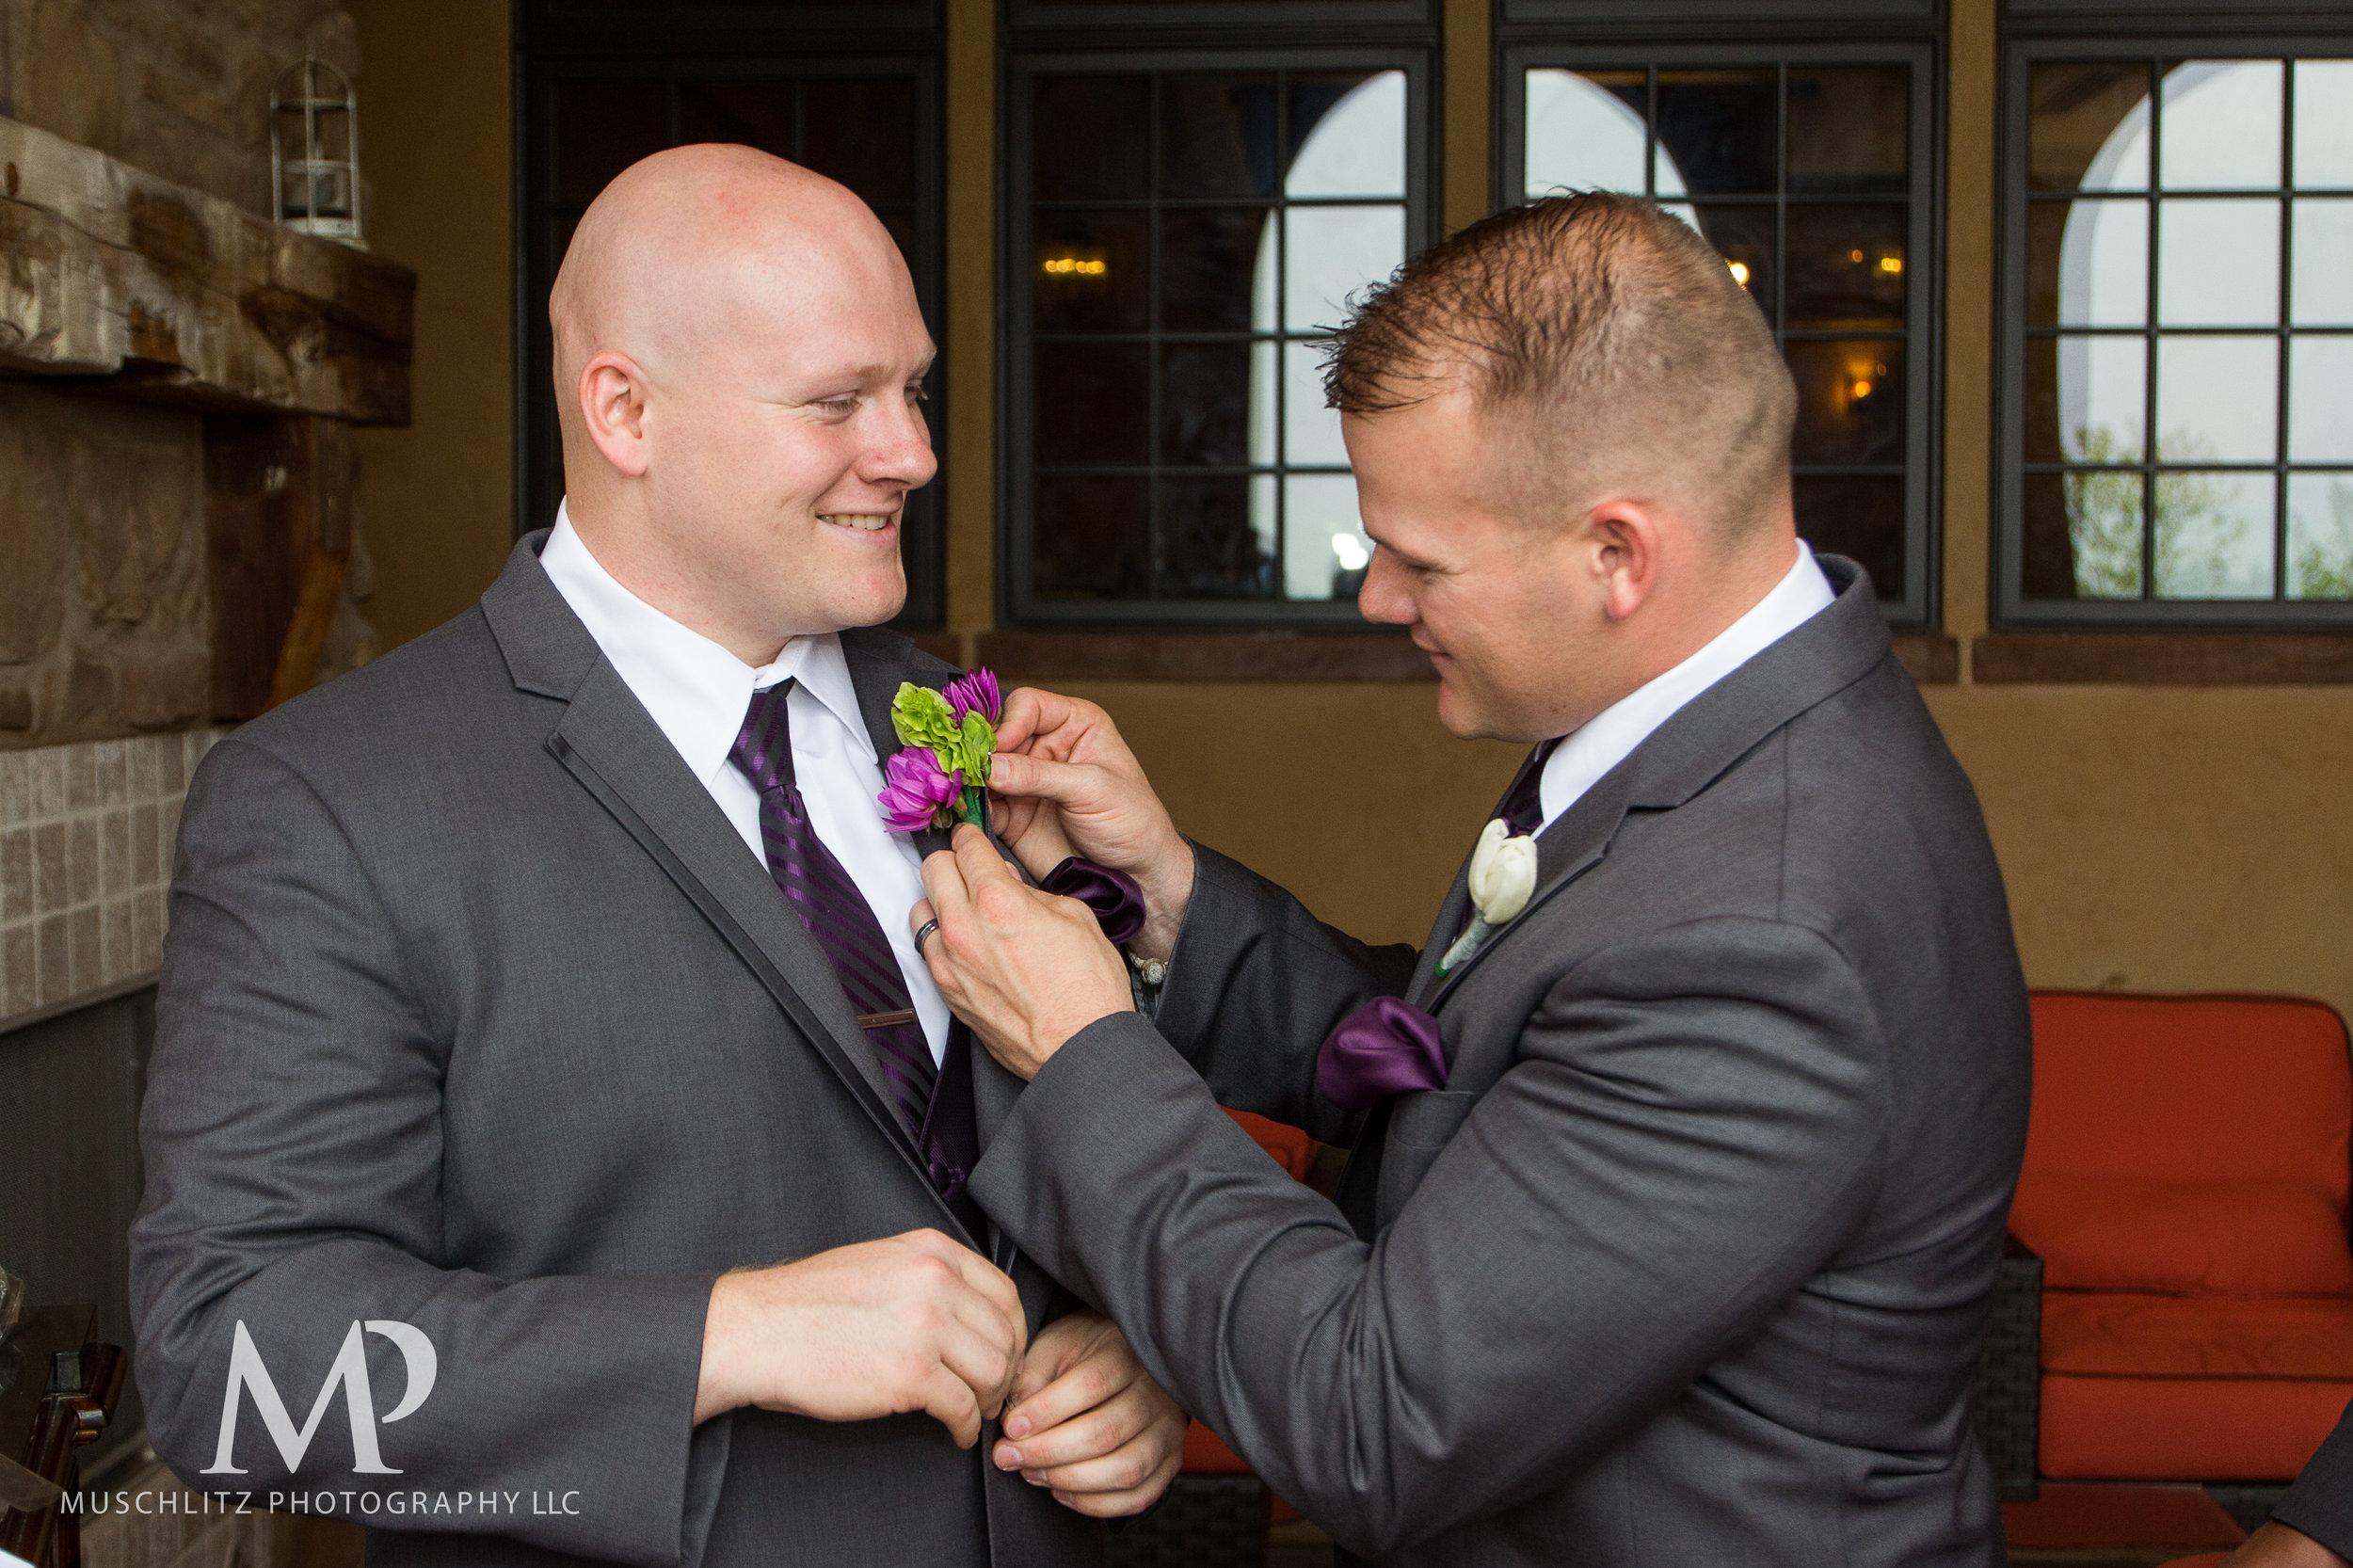 club-at-corazon-wedding-ceremony-reception-columbus-dublin-ohio-ohio-university-theme-017.JPG